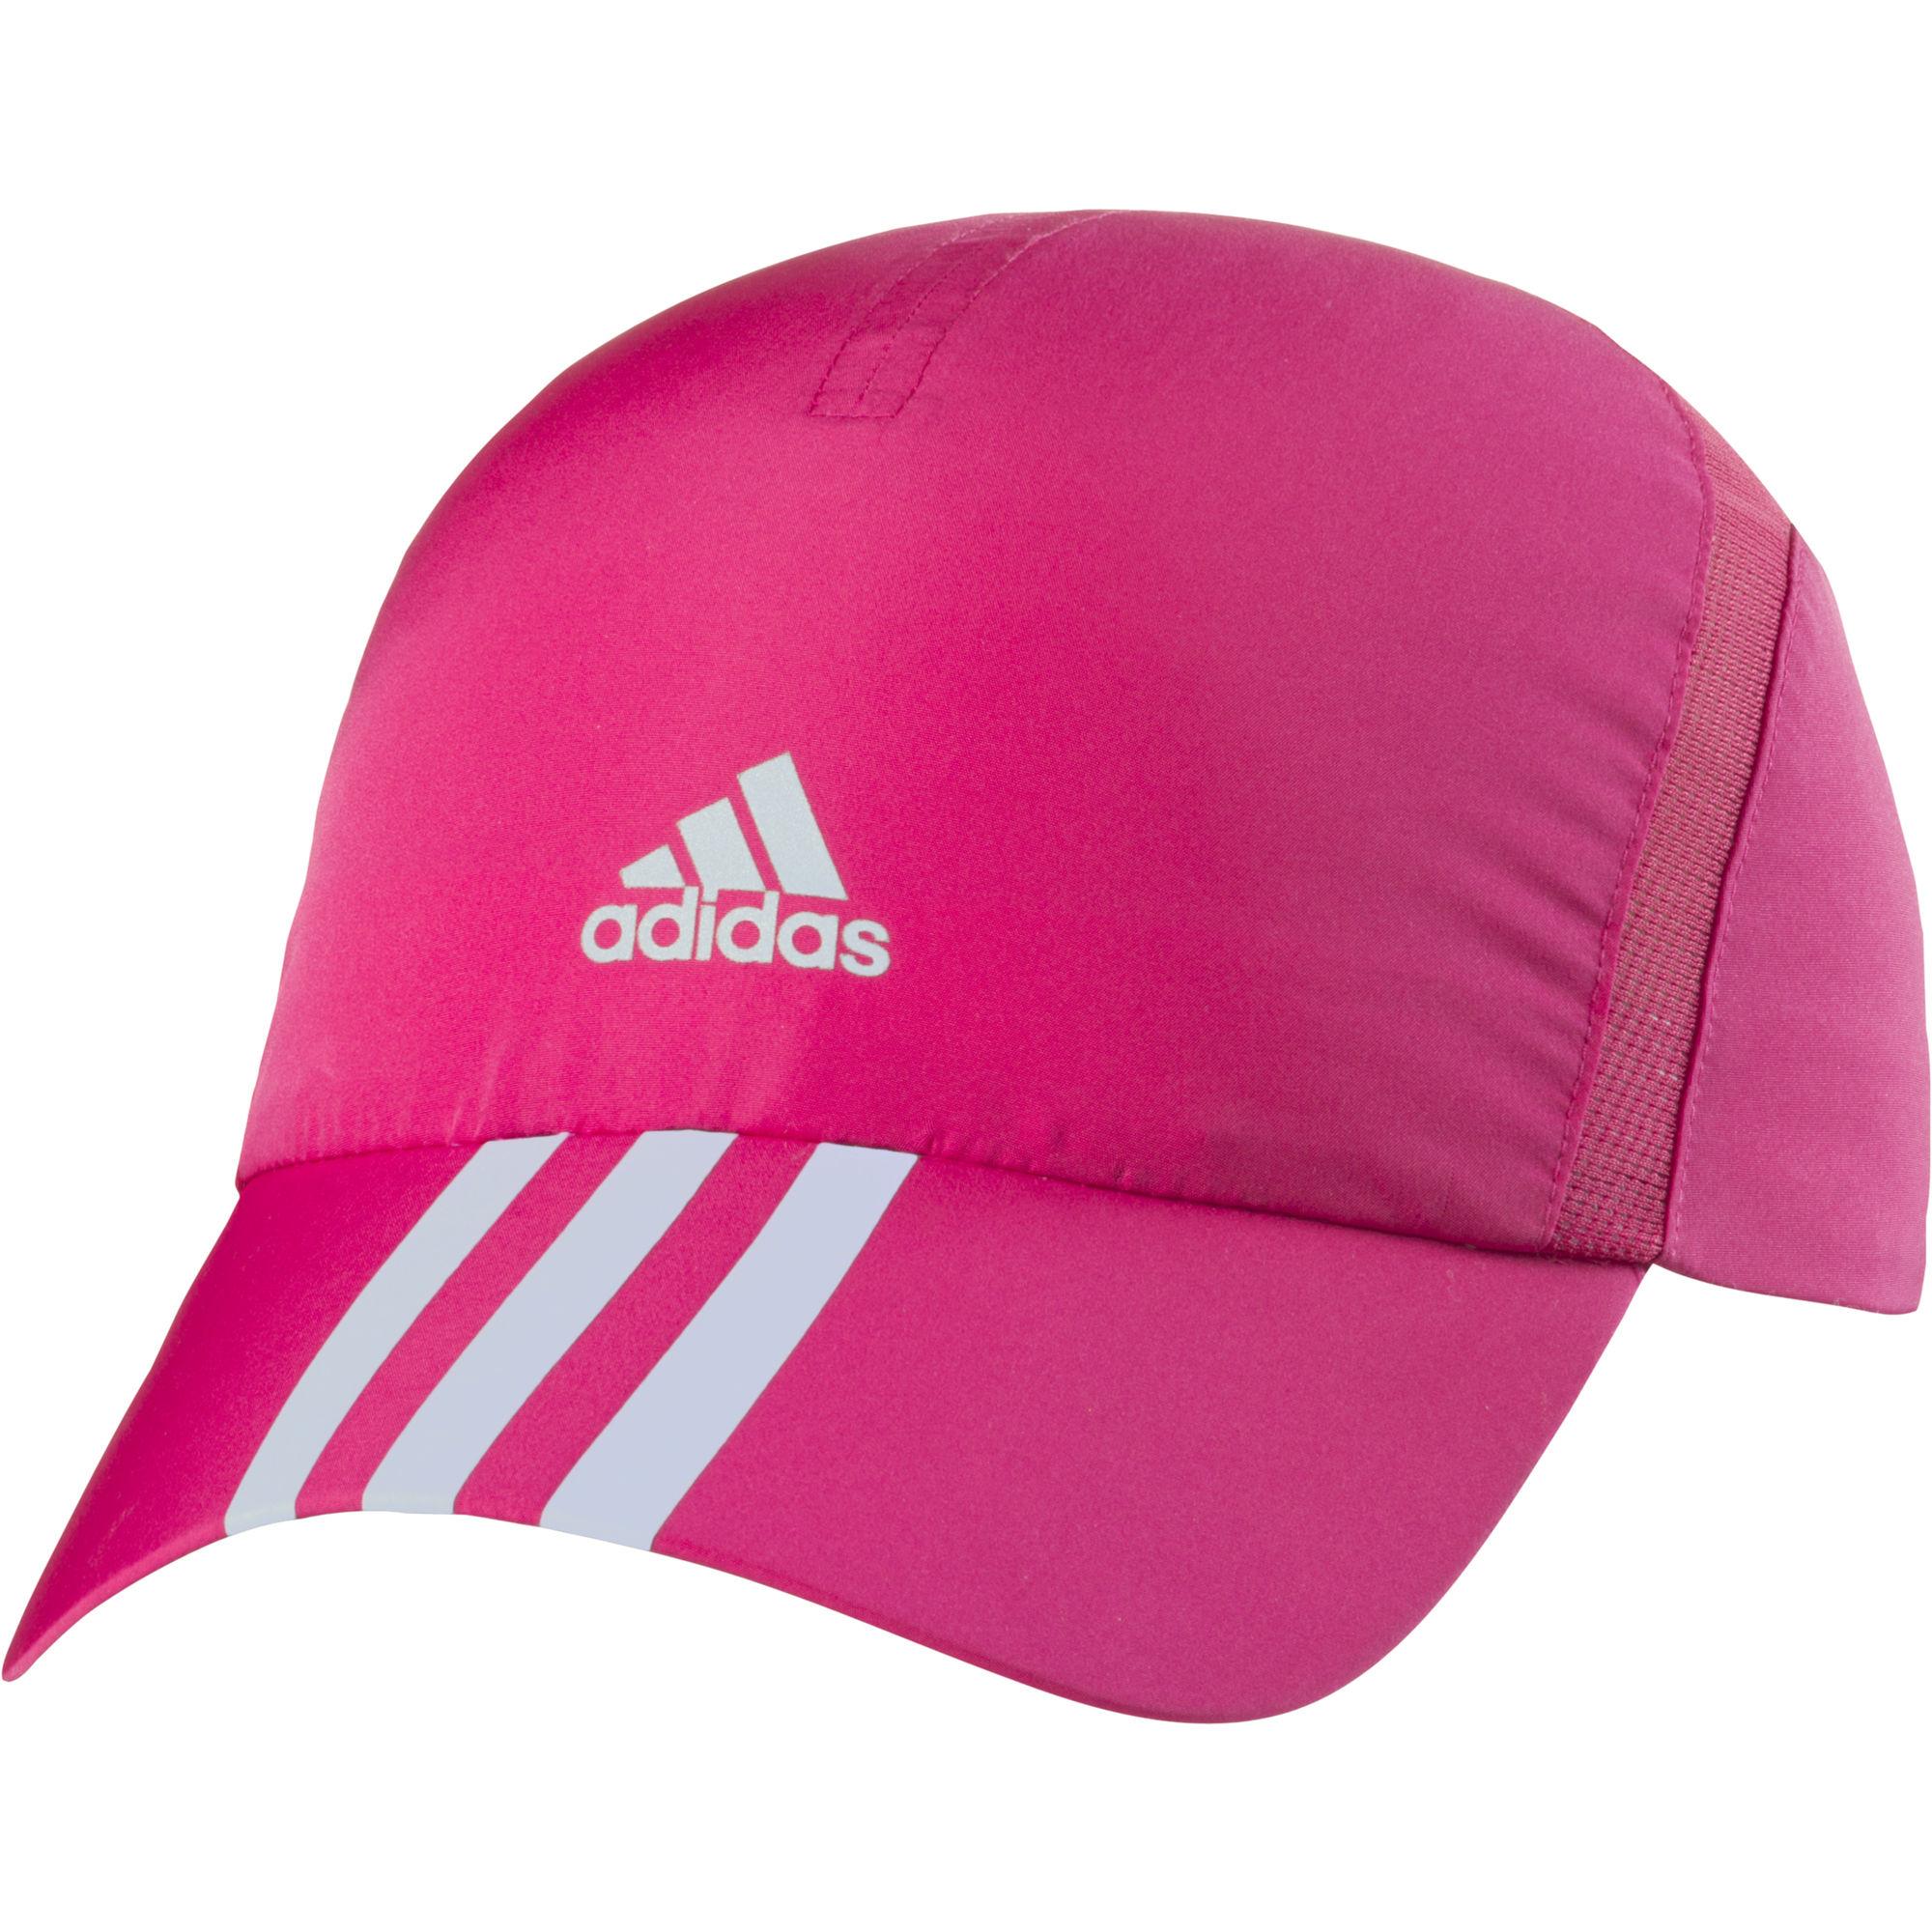 82dad5dad55 ADIDAS Climacool Pink Mesh Run